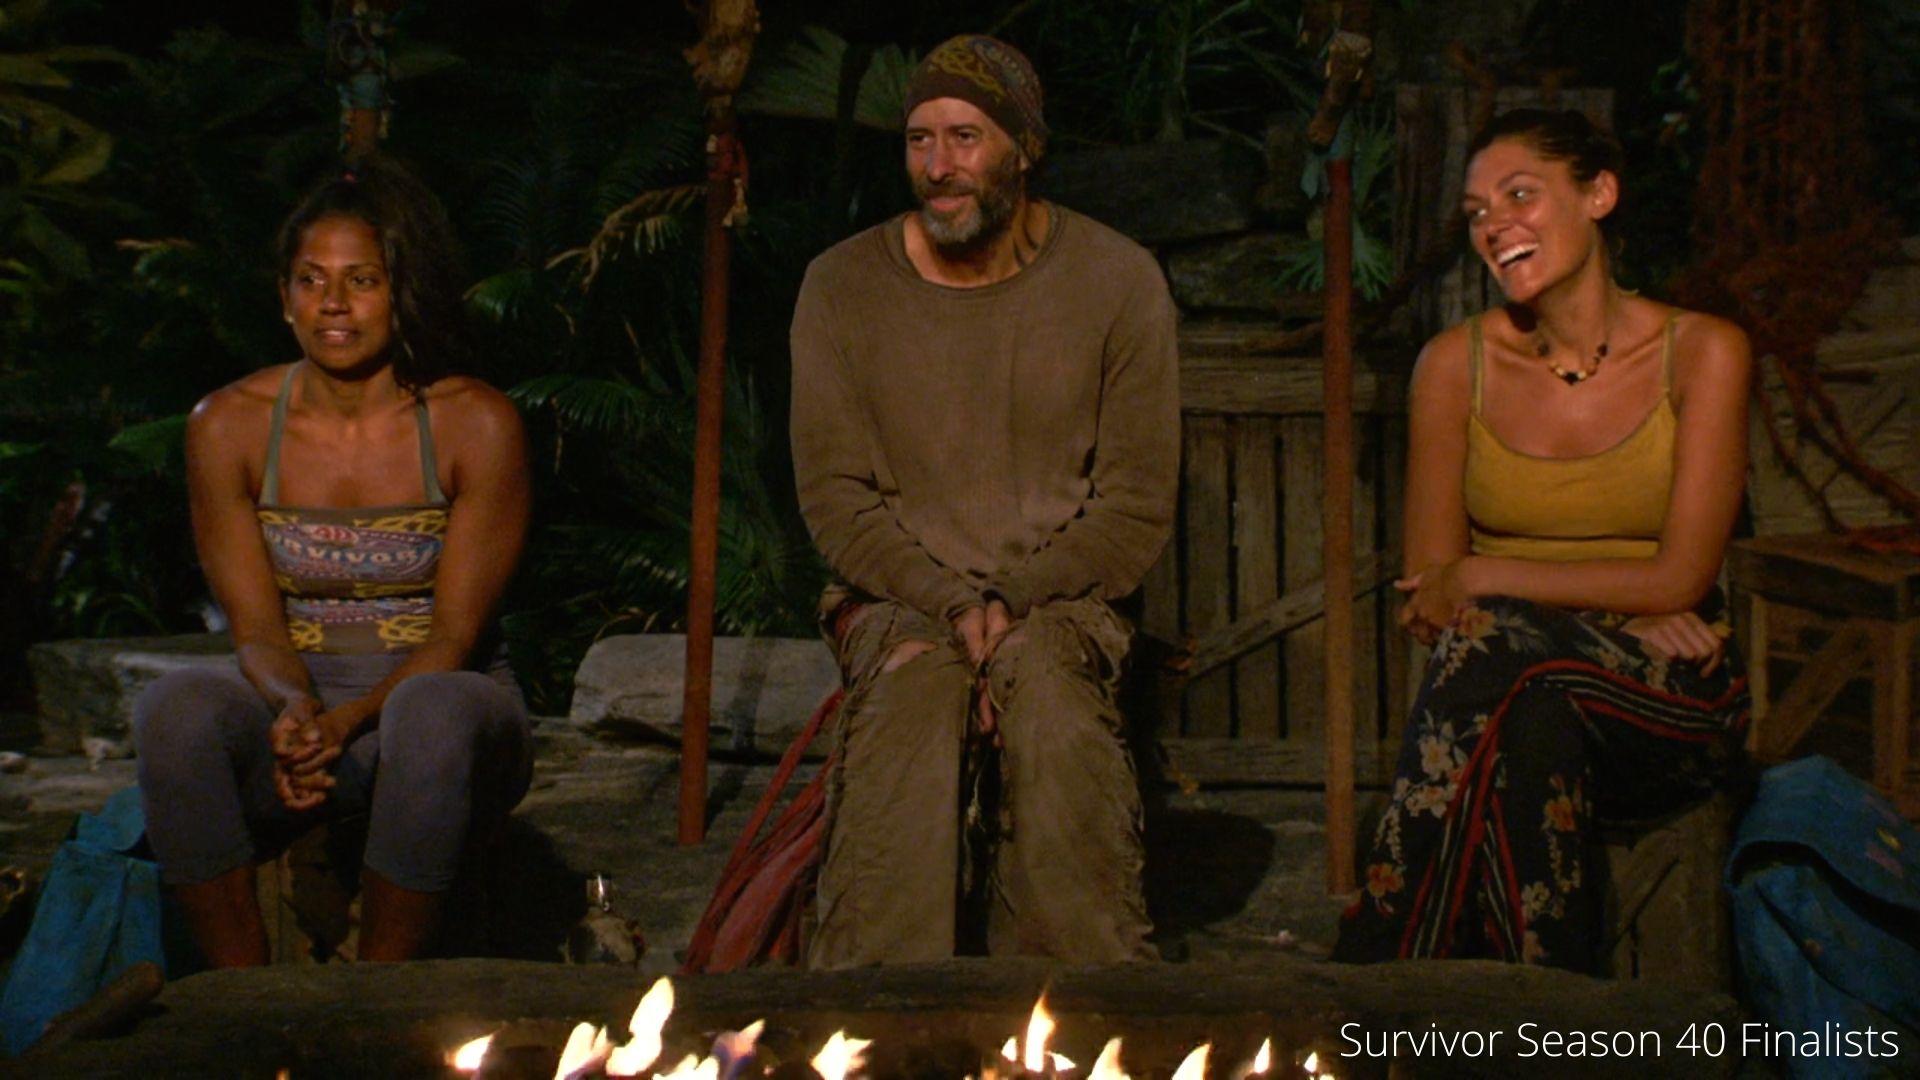 Survivor Season 41 Episode 1